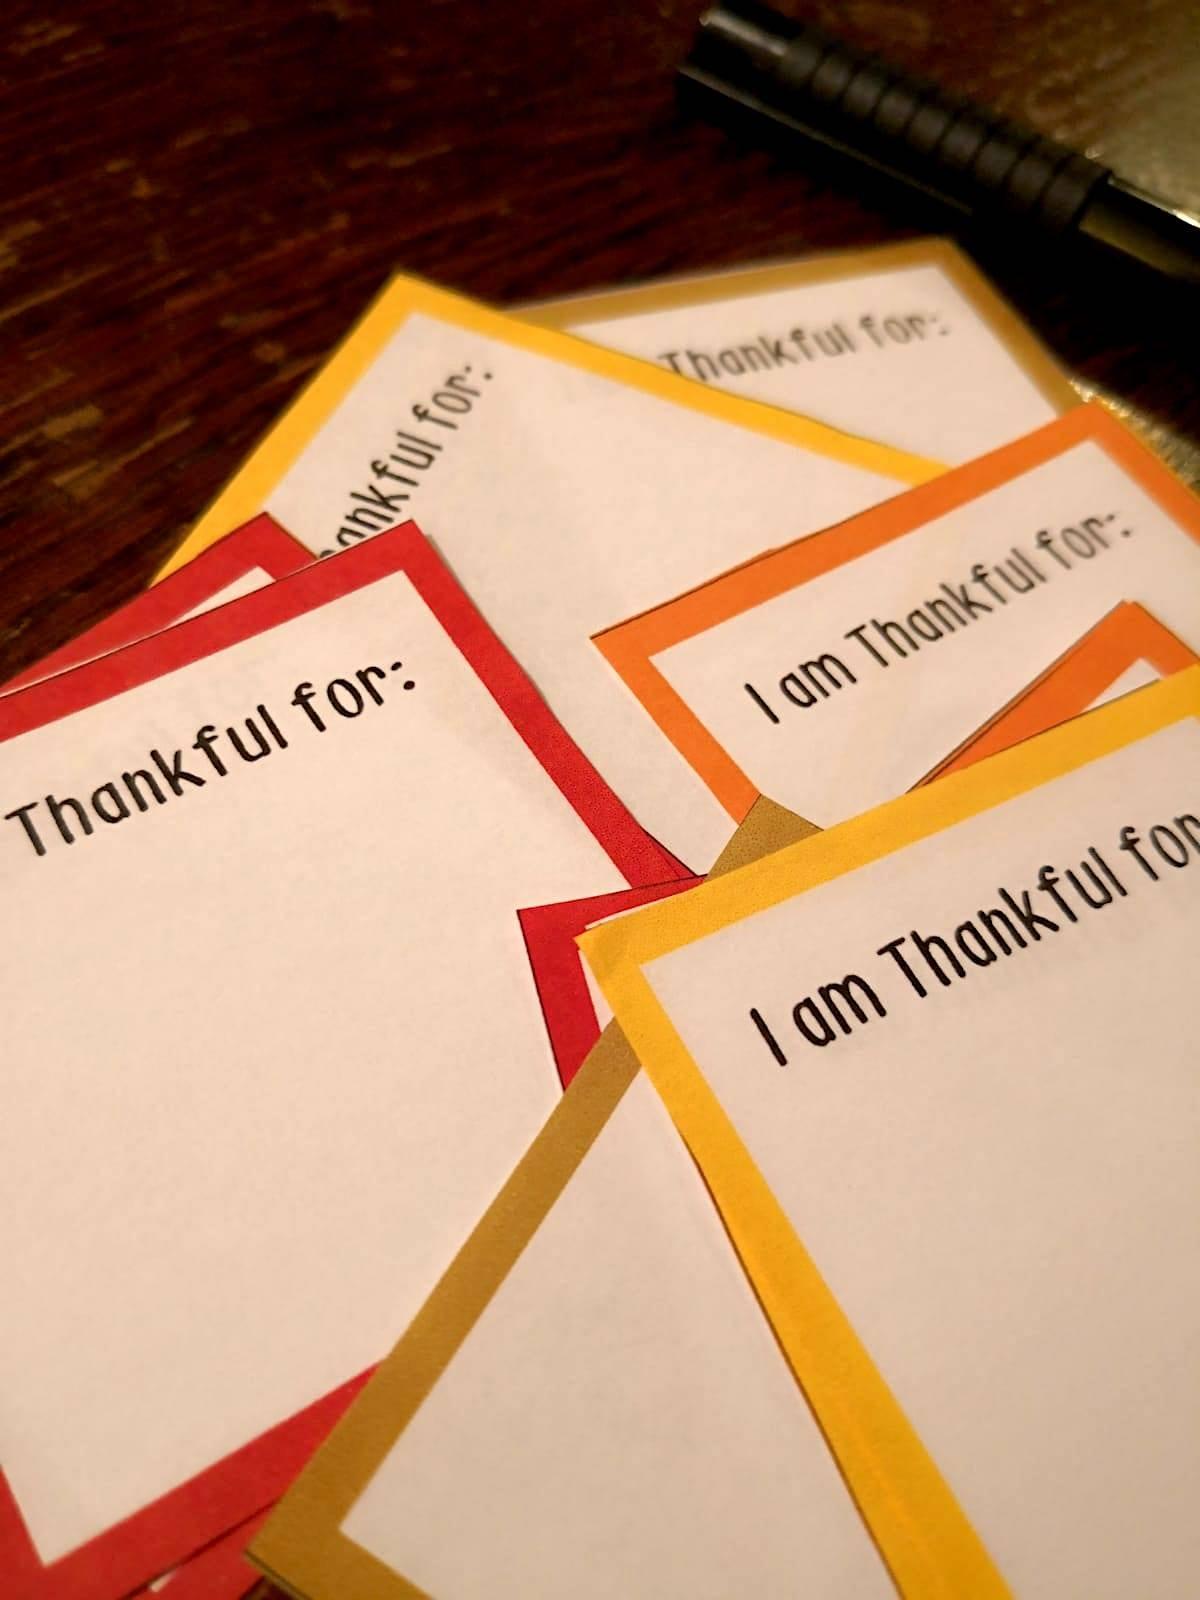 Thankfulness Printouts